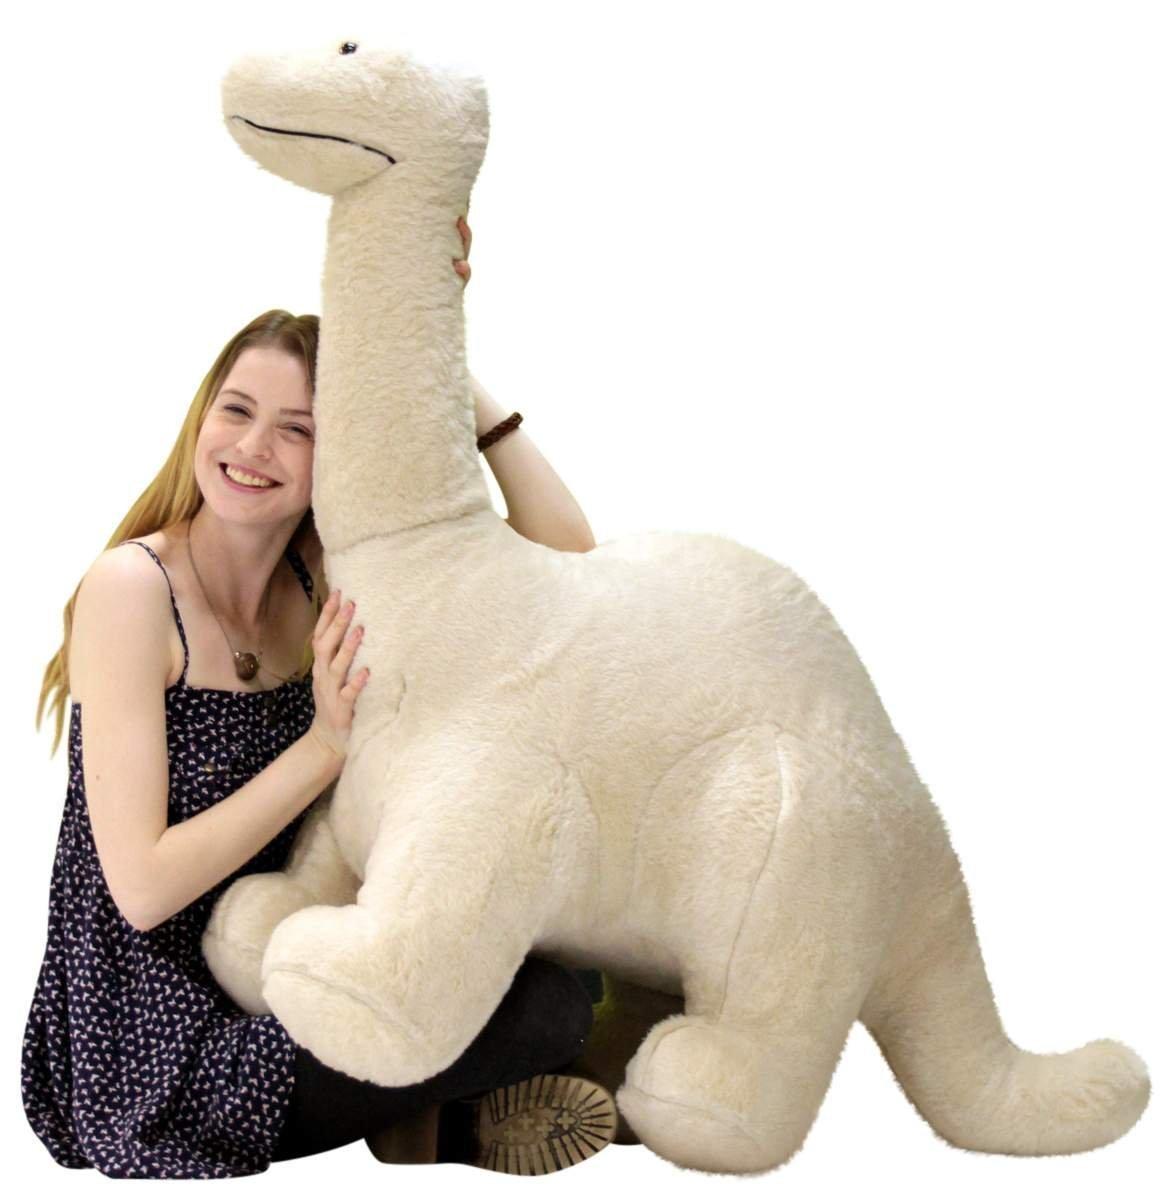 American Made Big Plush Papa Dinosaur, Soft Giant Stuffed Brontosaurus 4 Feet Long 3 Feet Tall Made in USA